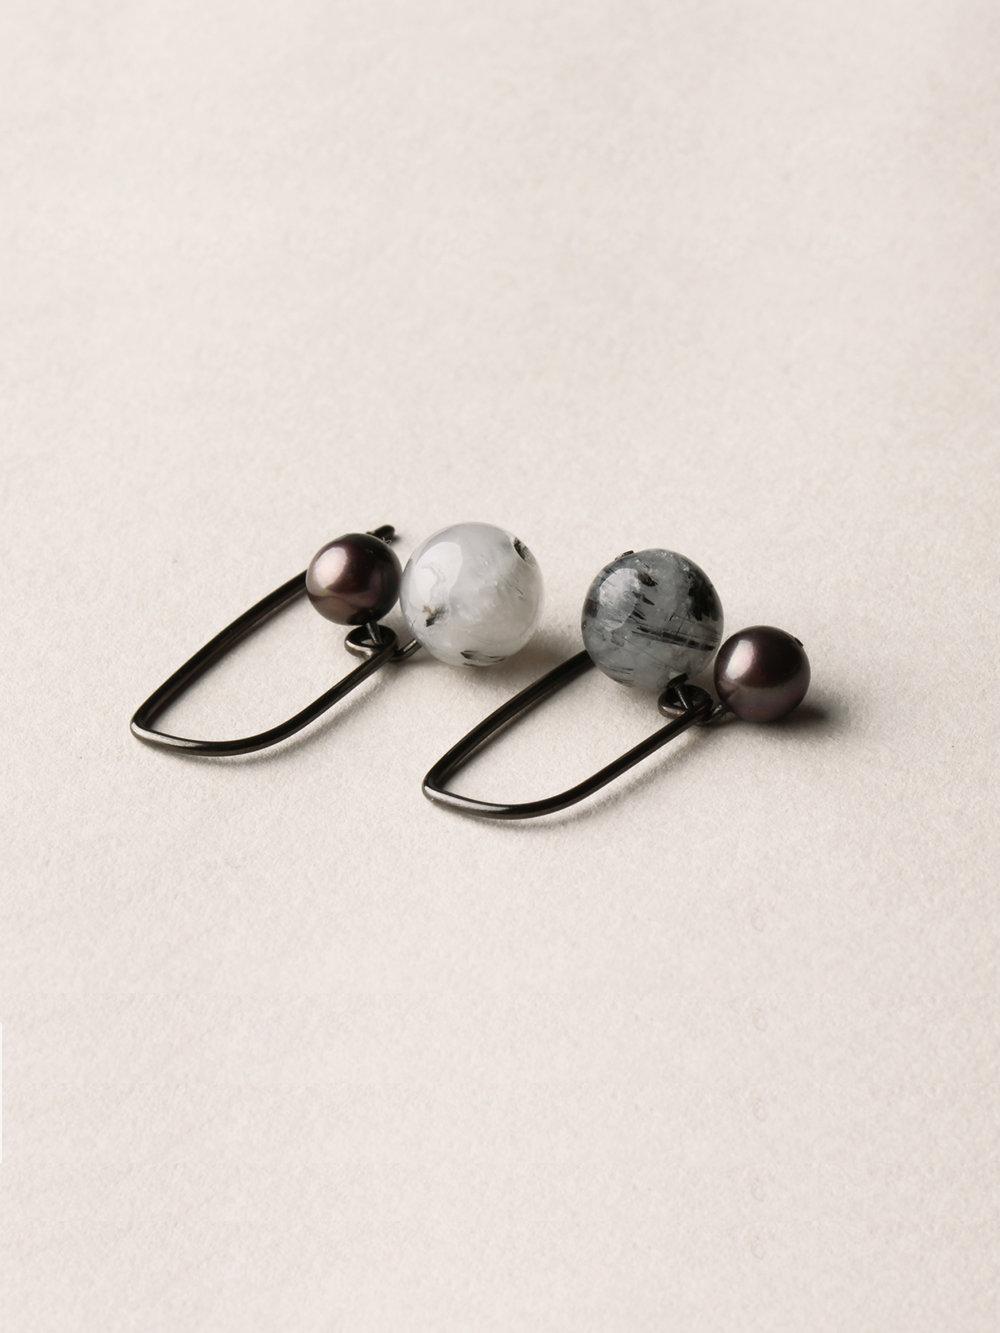 Perlen Ohrhänger, kurz in schwarzrutheniertem Silber, echten Süßwasserzuchtperlen und Rutilquarzperlen/ Pearl earrings, short in blackruthenized silver, sweetwater pearls and love arrows pearls